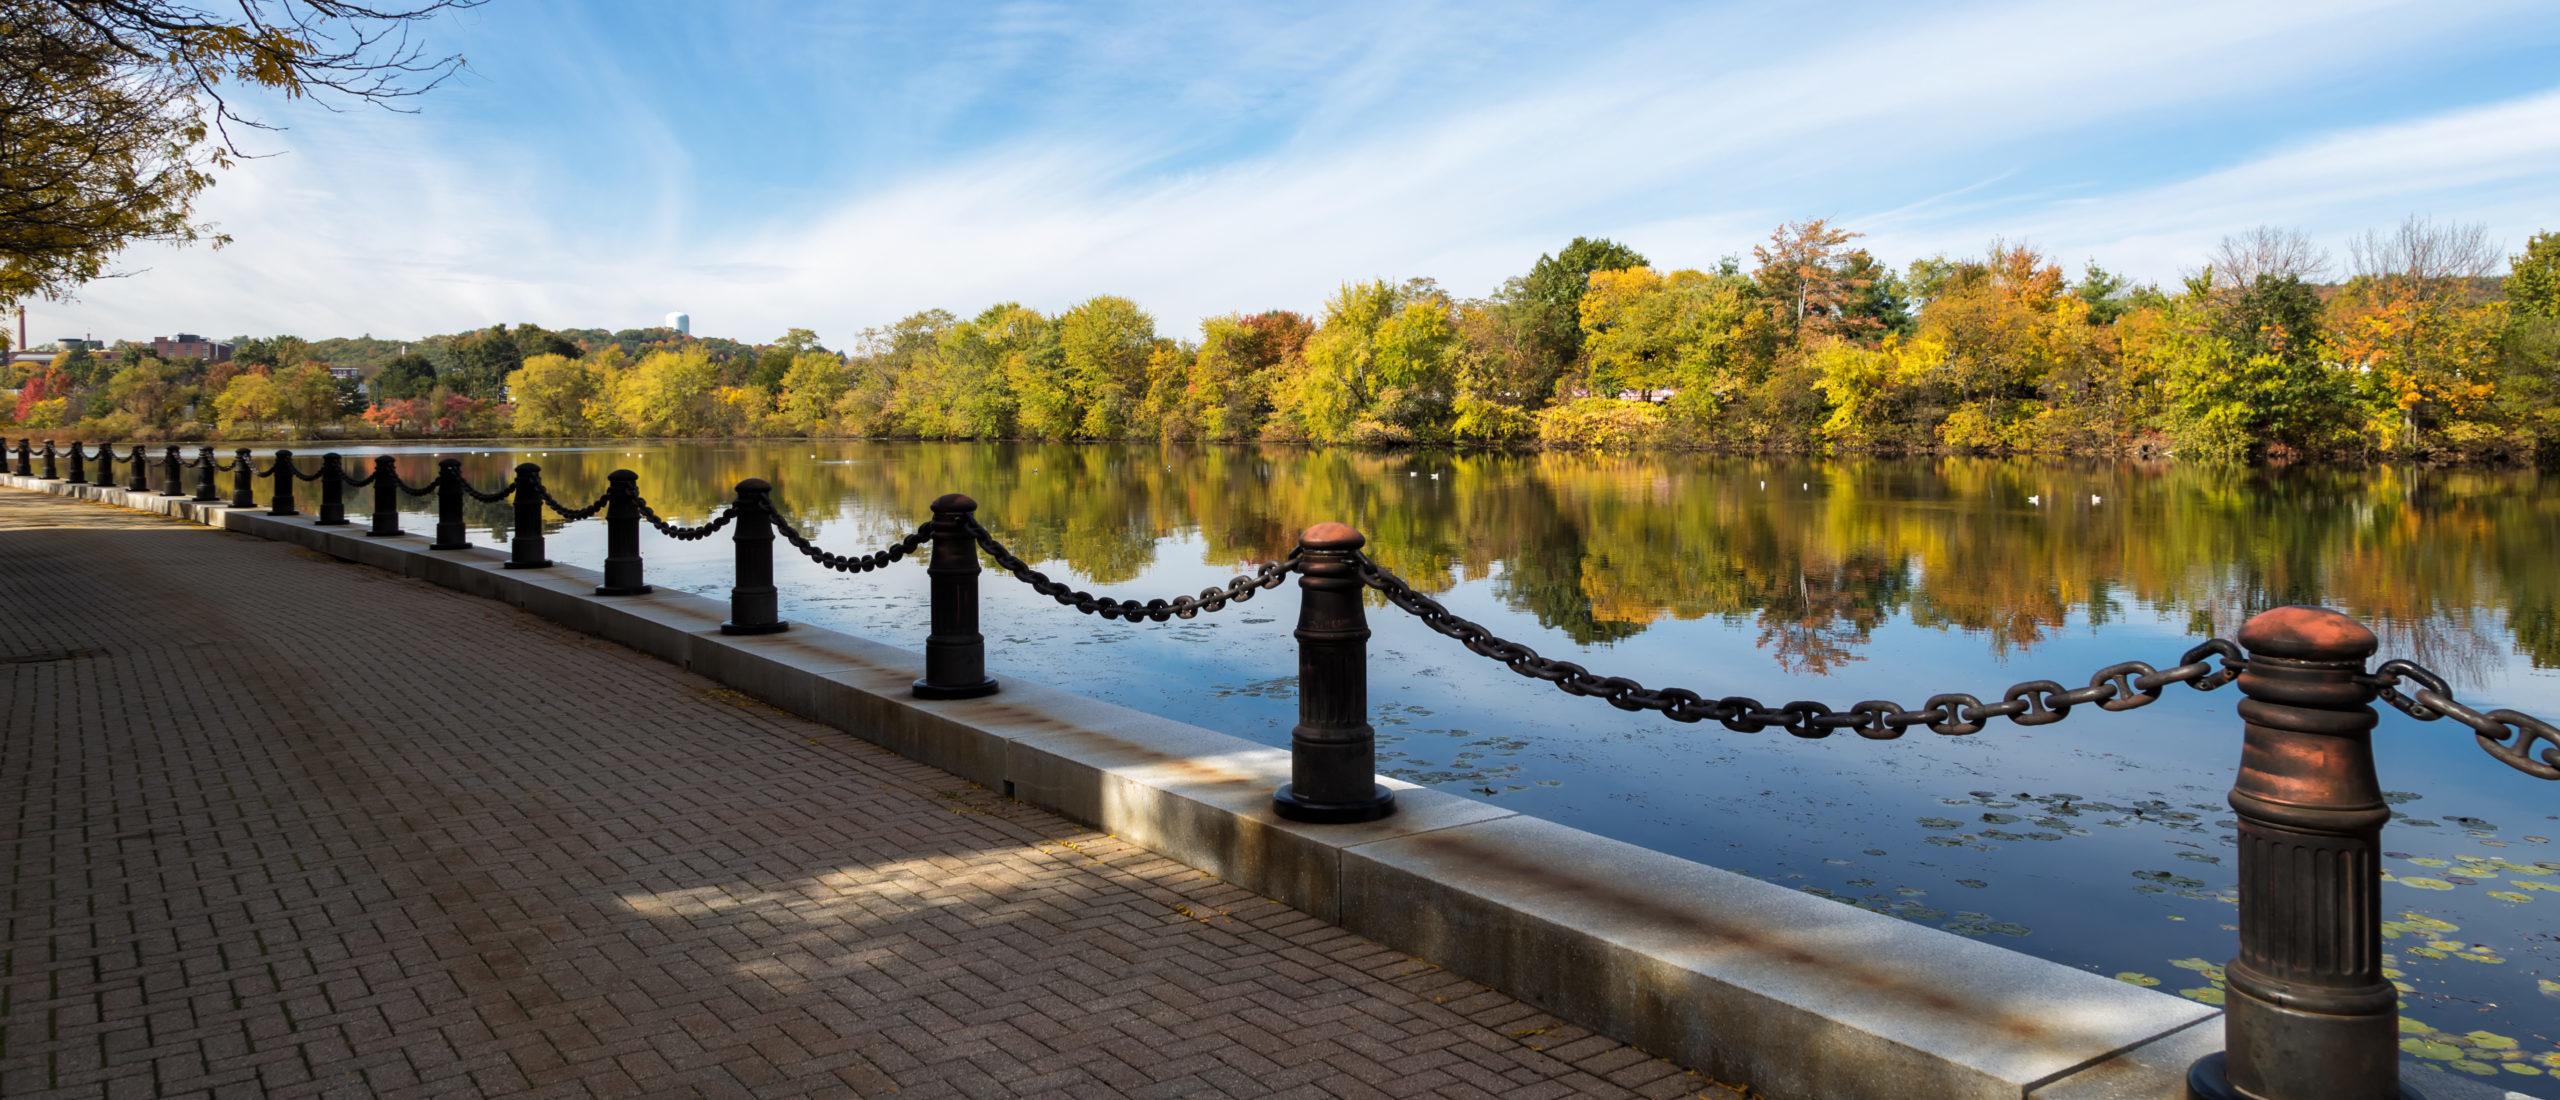 Waltham, Massachusetts by Luis Enrique Torres. Shutterstock.